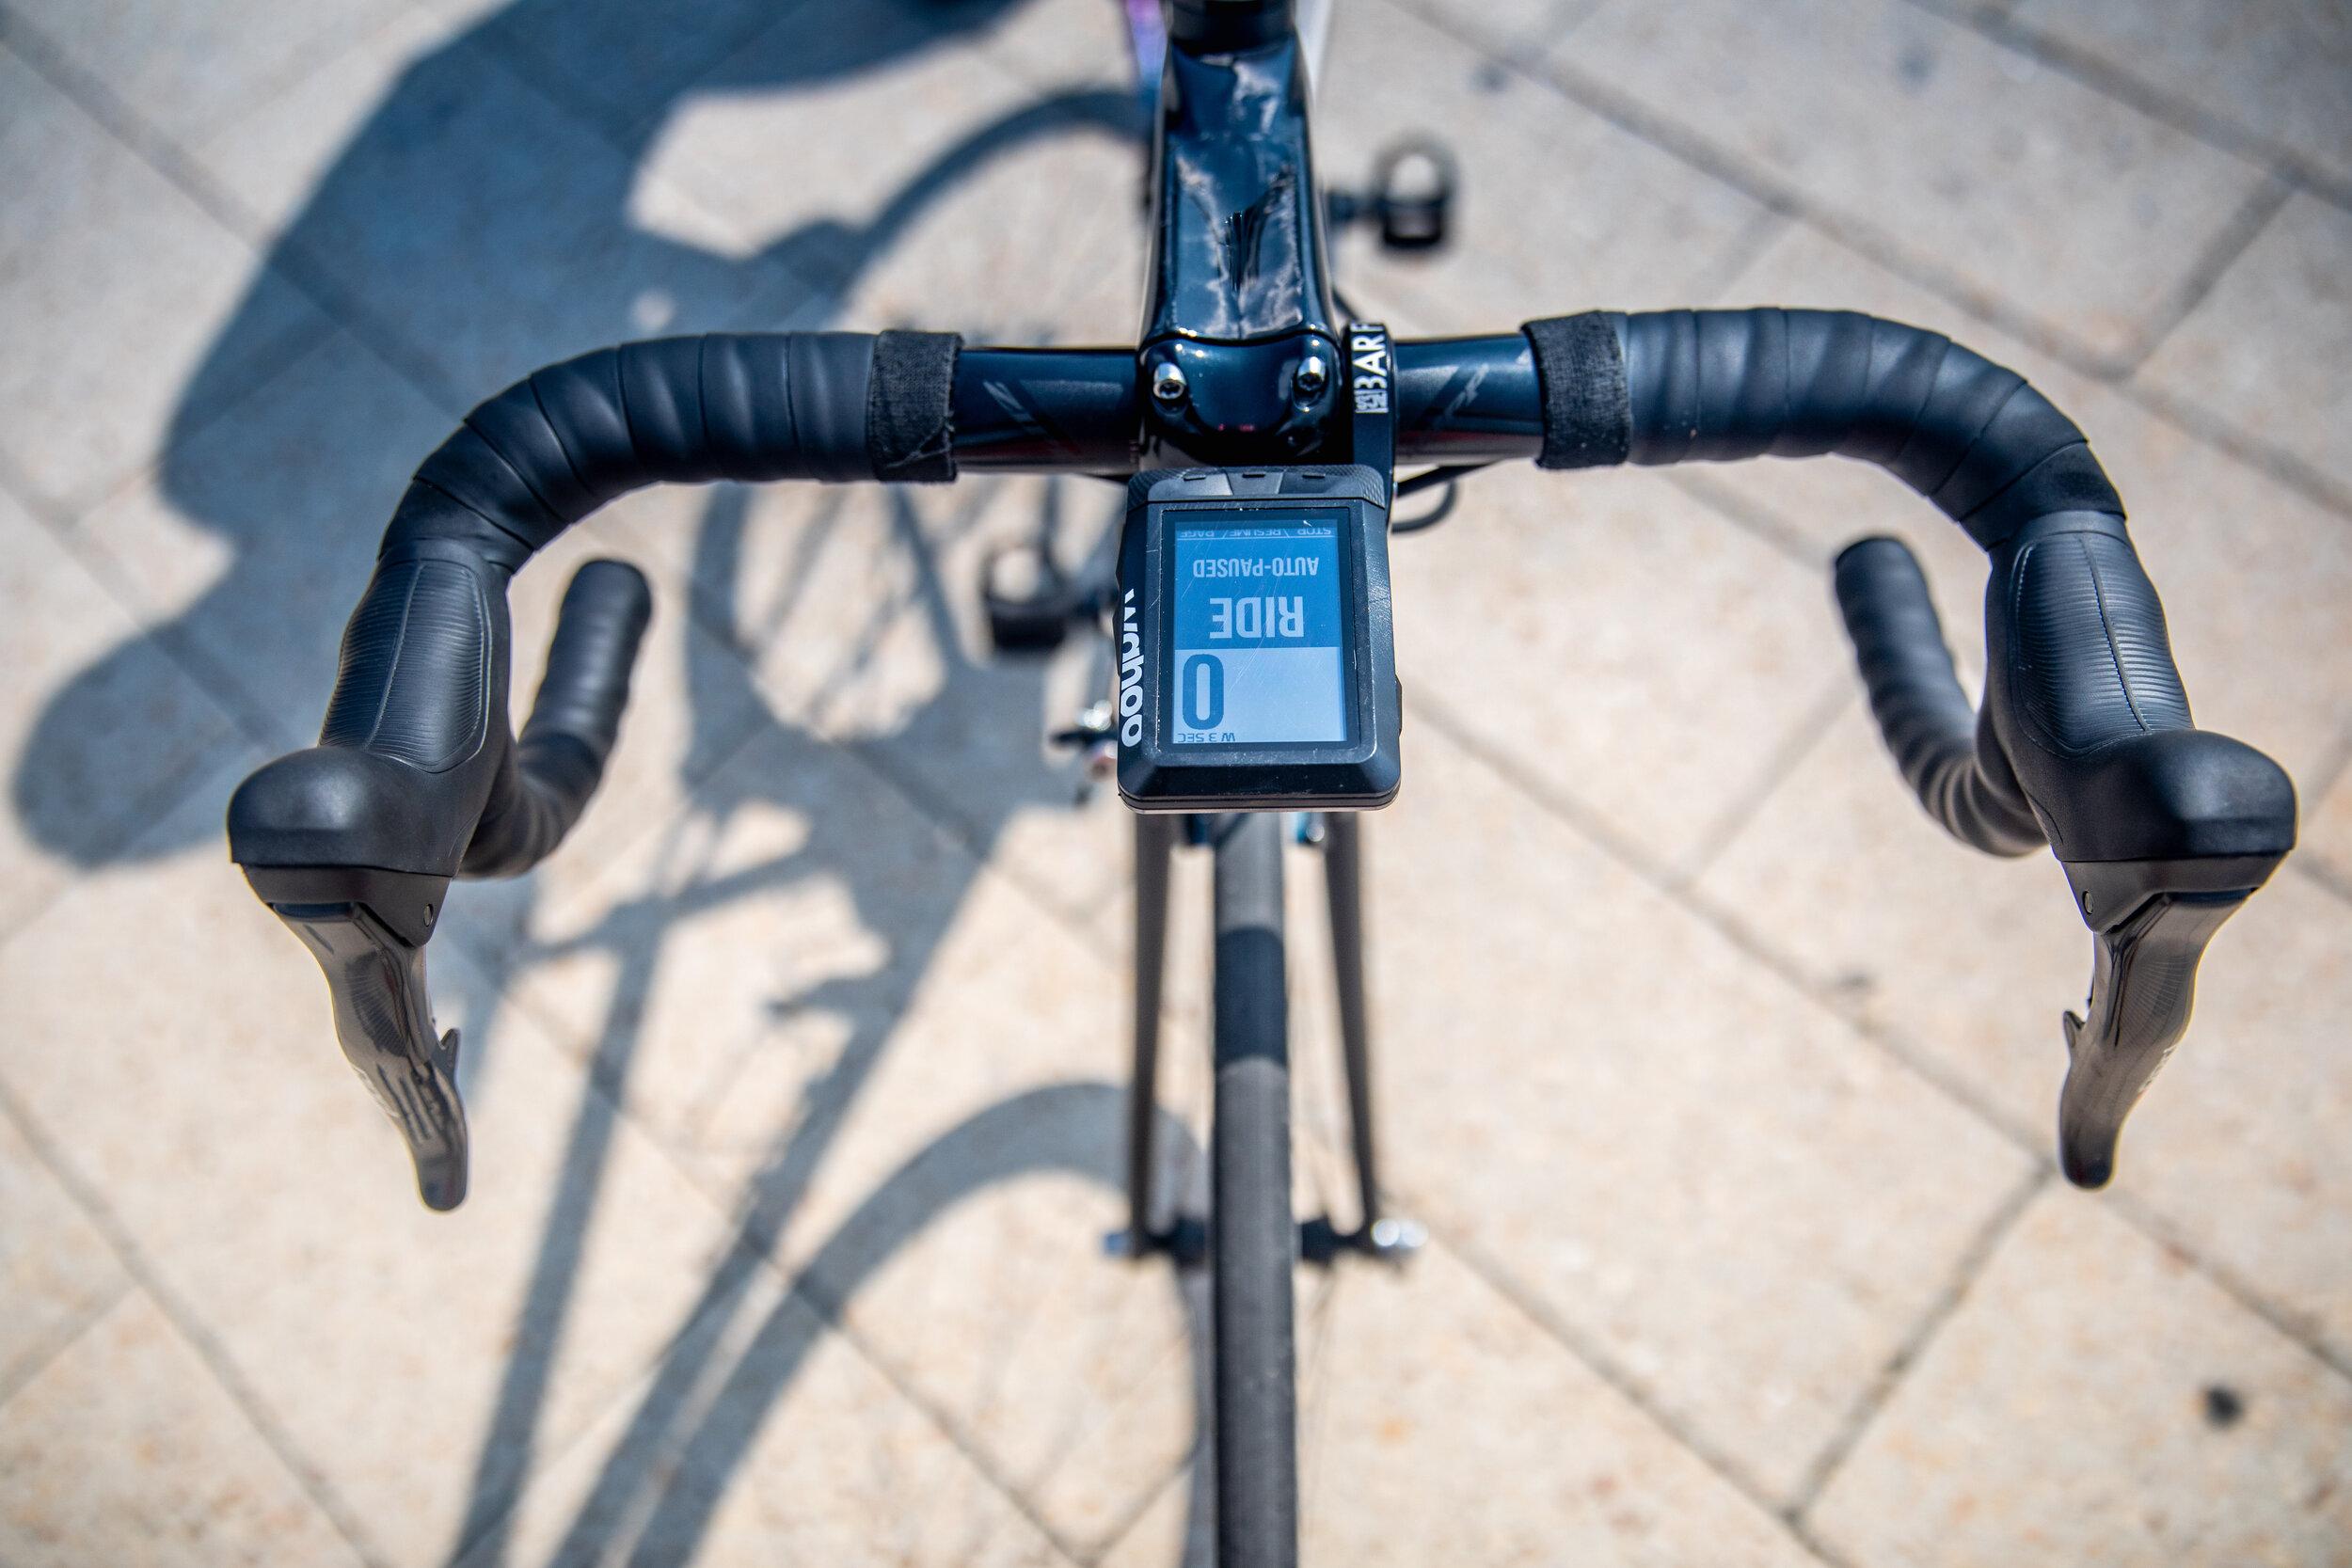 Bikes are fun  Ride a fun bike  Tom's Moots Vamoots RSL — To